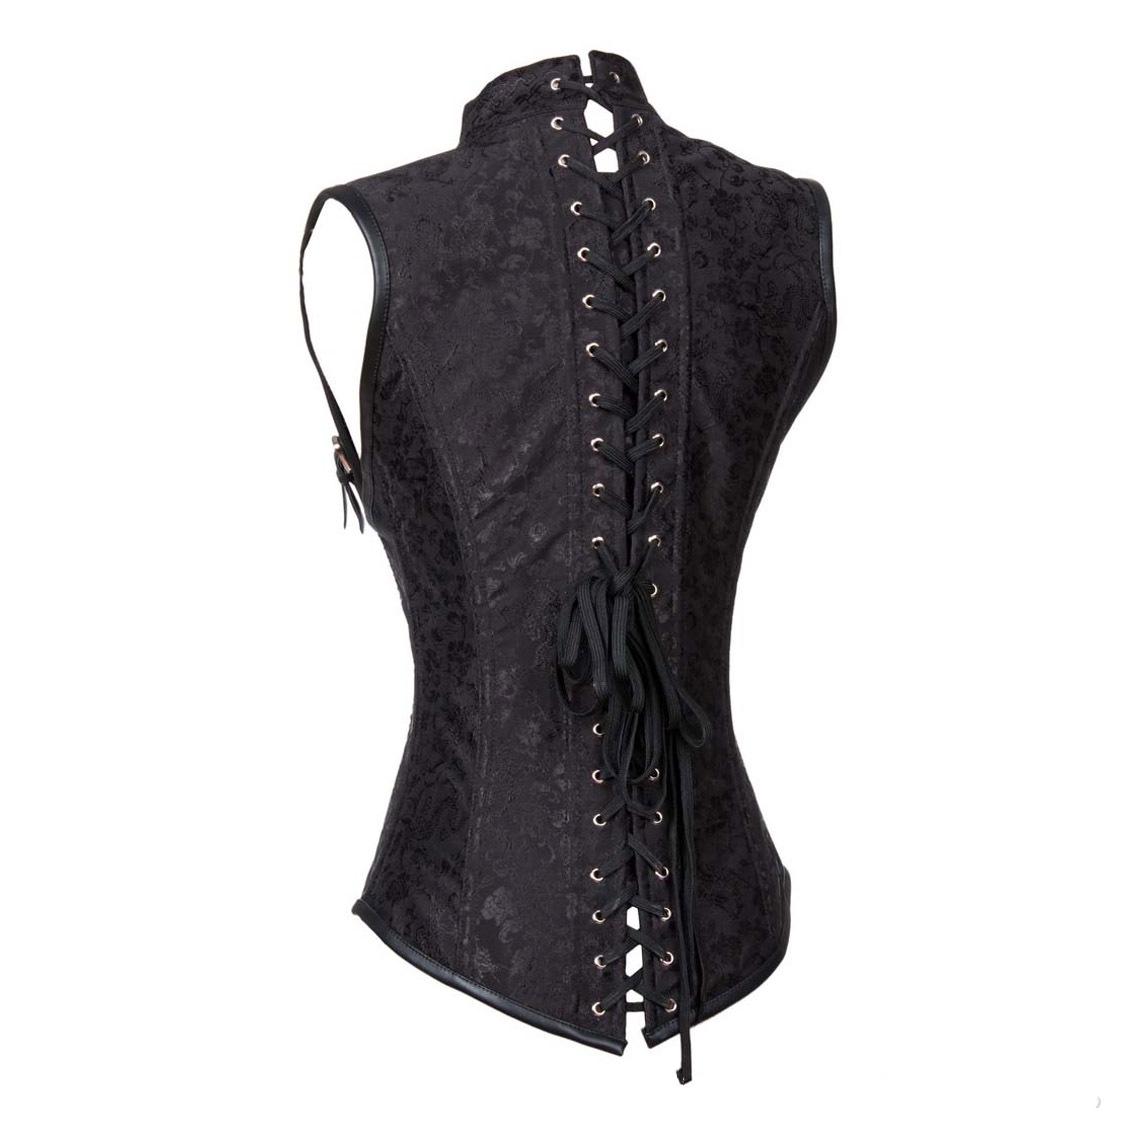 rebelsmarket_gothic_buckle_up_armor_underbust_waist_spiral_steel_boned_jacquard_corset_bustiers_and_corsets_4.jpg